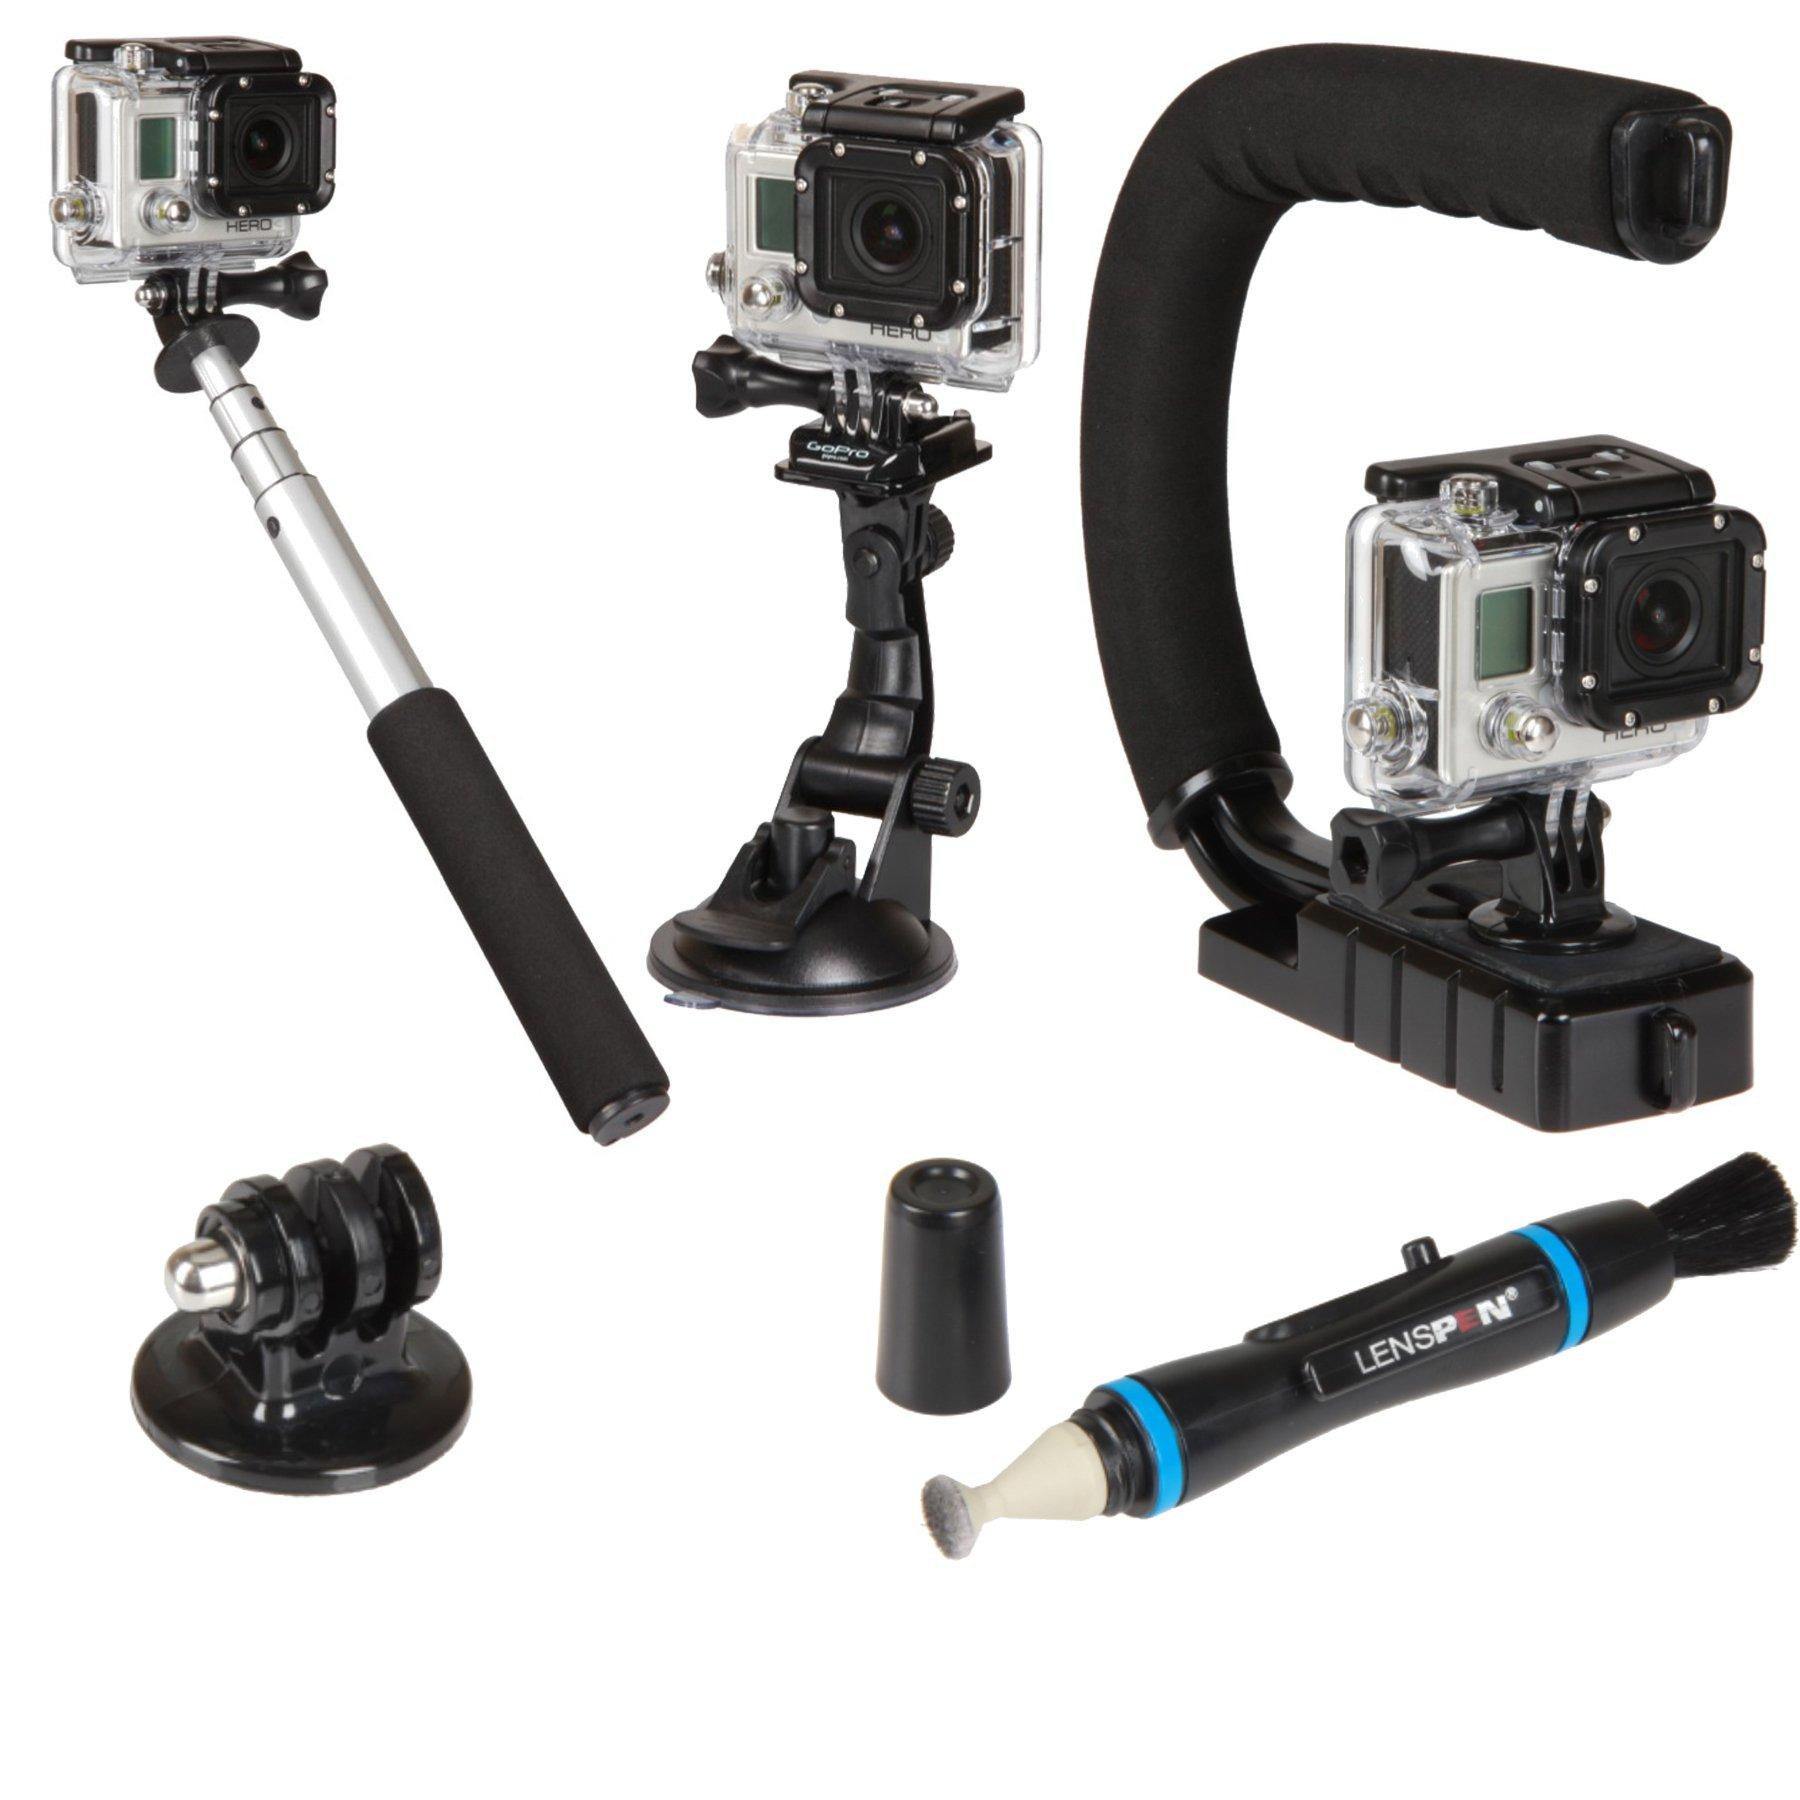 Sunpak ACTION-5 Action Camera Accessory Kit (Black) by SUNPAK